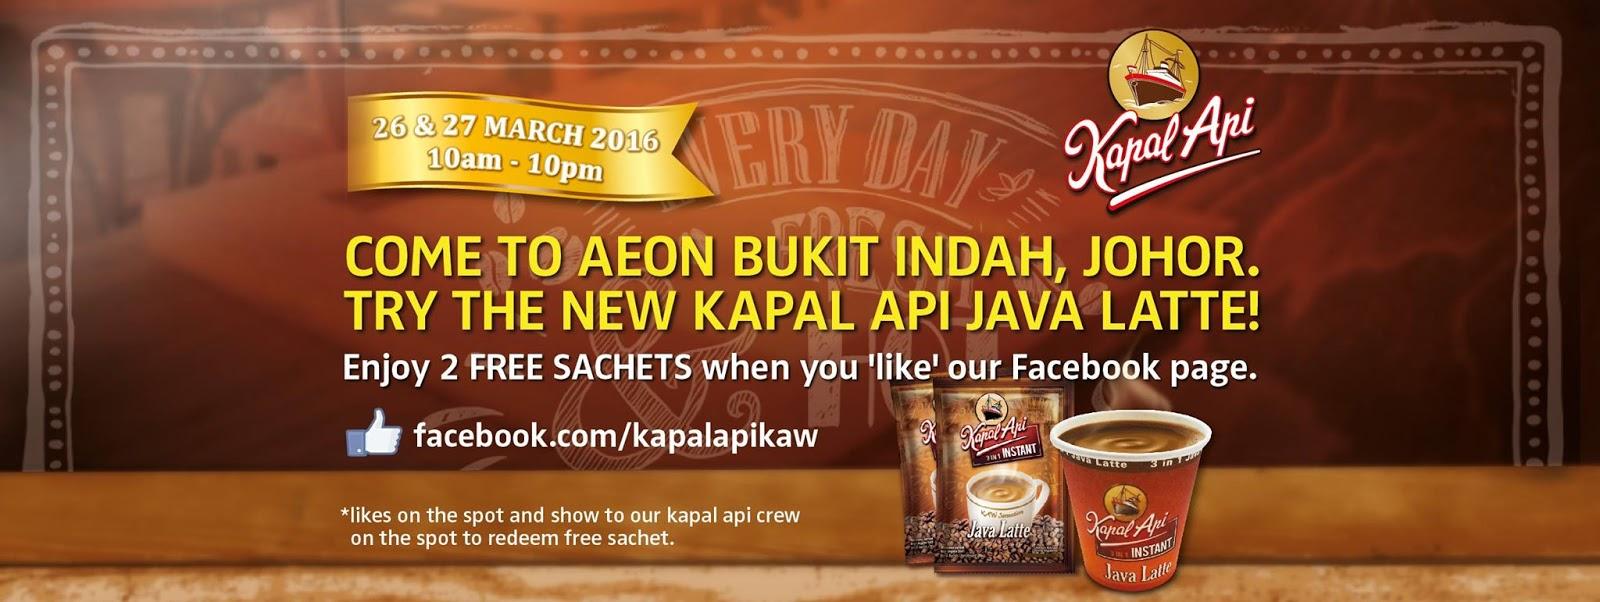 Bestlah March 2016 Kapal Api Coffee Candy Bag Pack Of 3 Enjoy 2 Free Sachets Java Latte 26 27 Mar